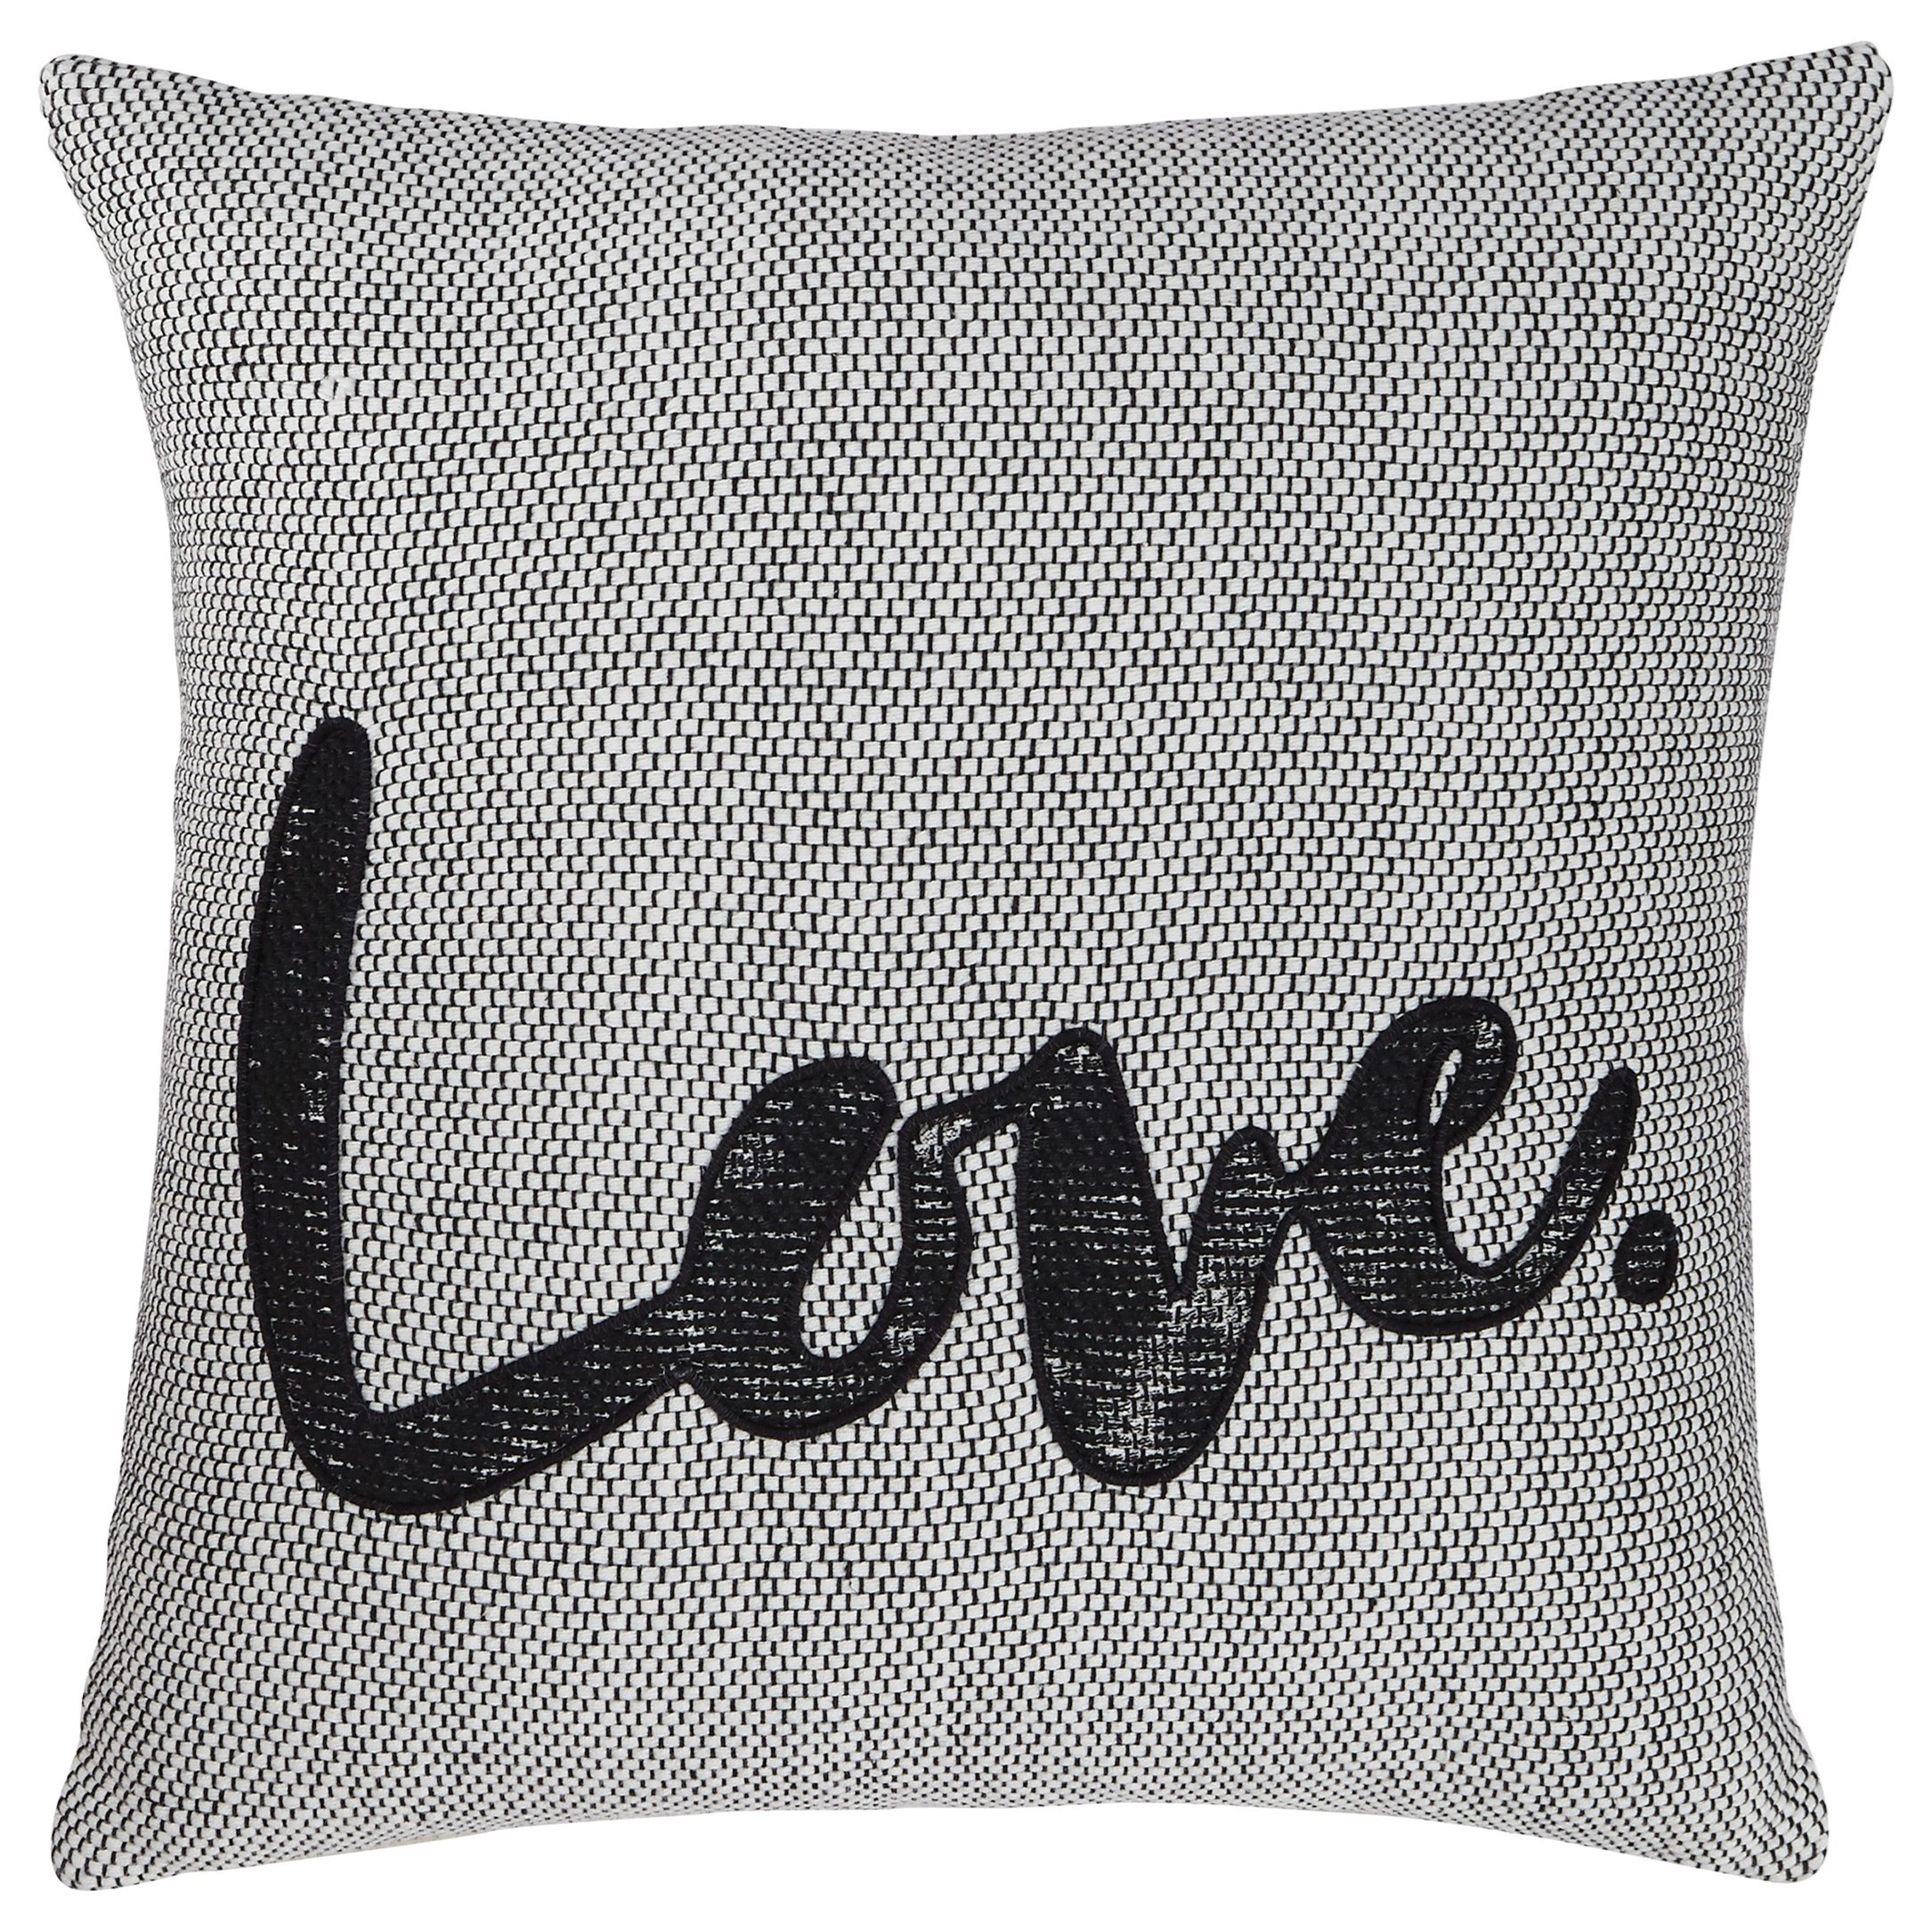 Pillows Mattia White/Black Pillow by Ashley (Signature Design) at Johnny Janosik